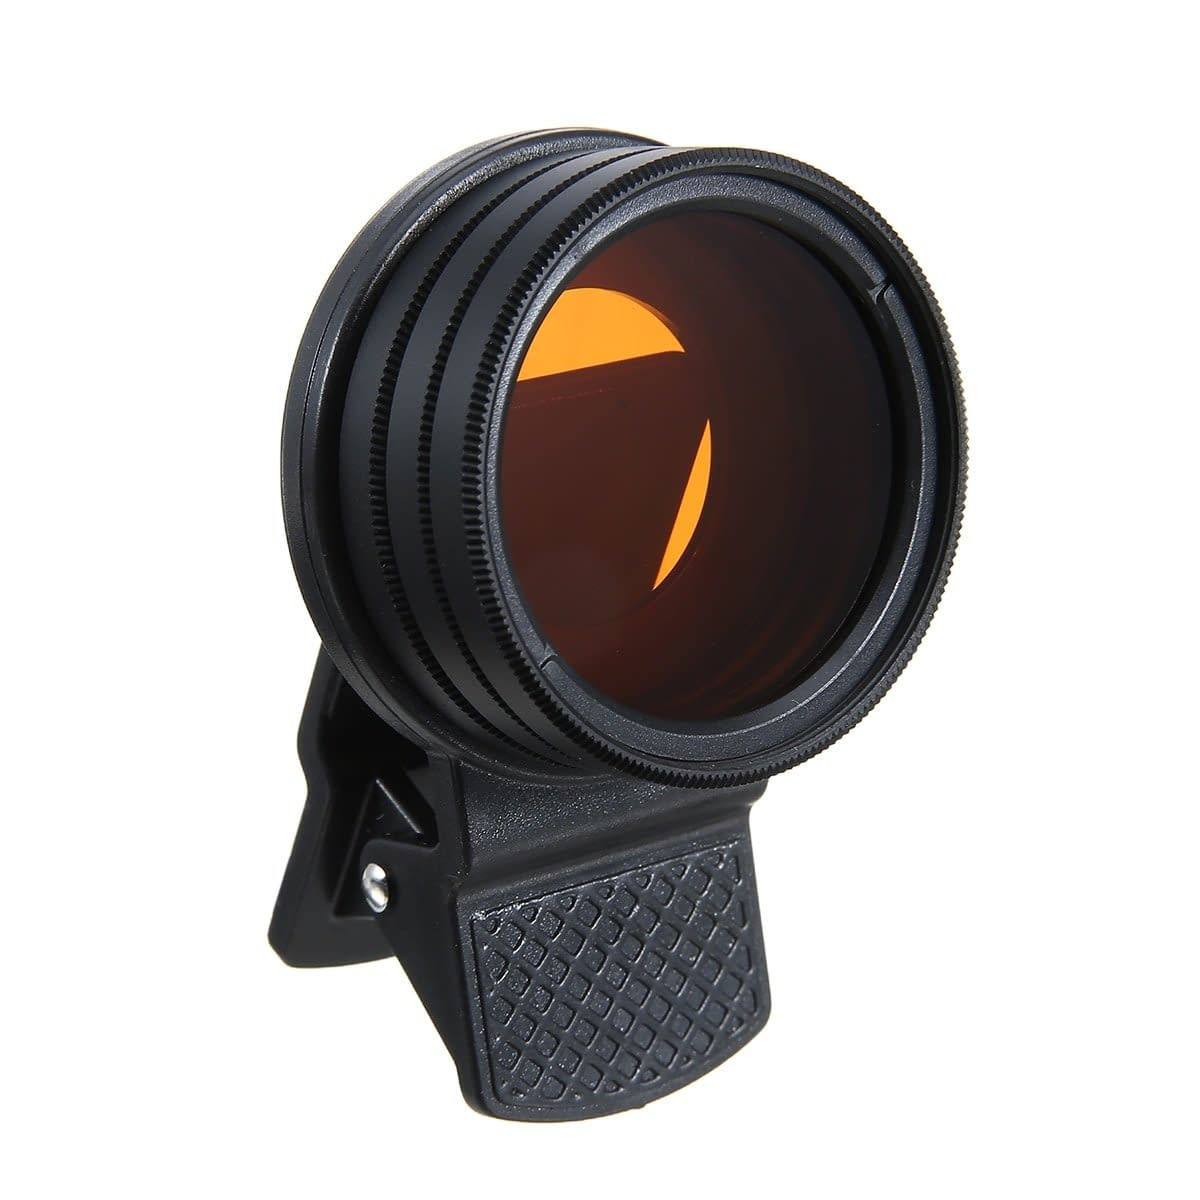 Aquarium Macro Lens for Fish Tank Photography